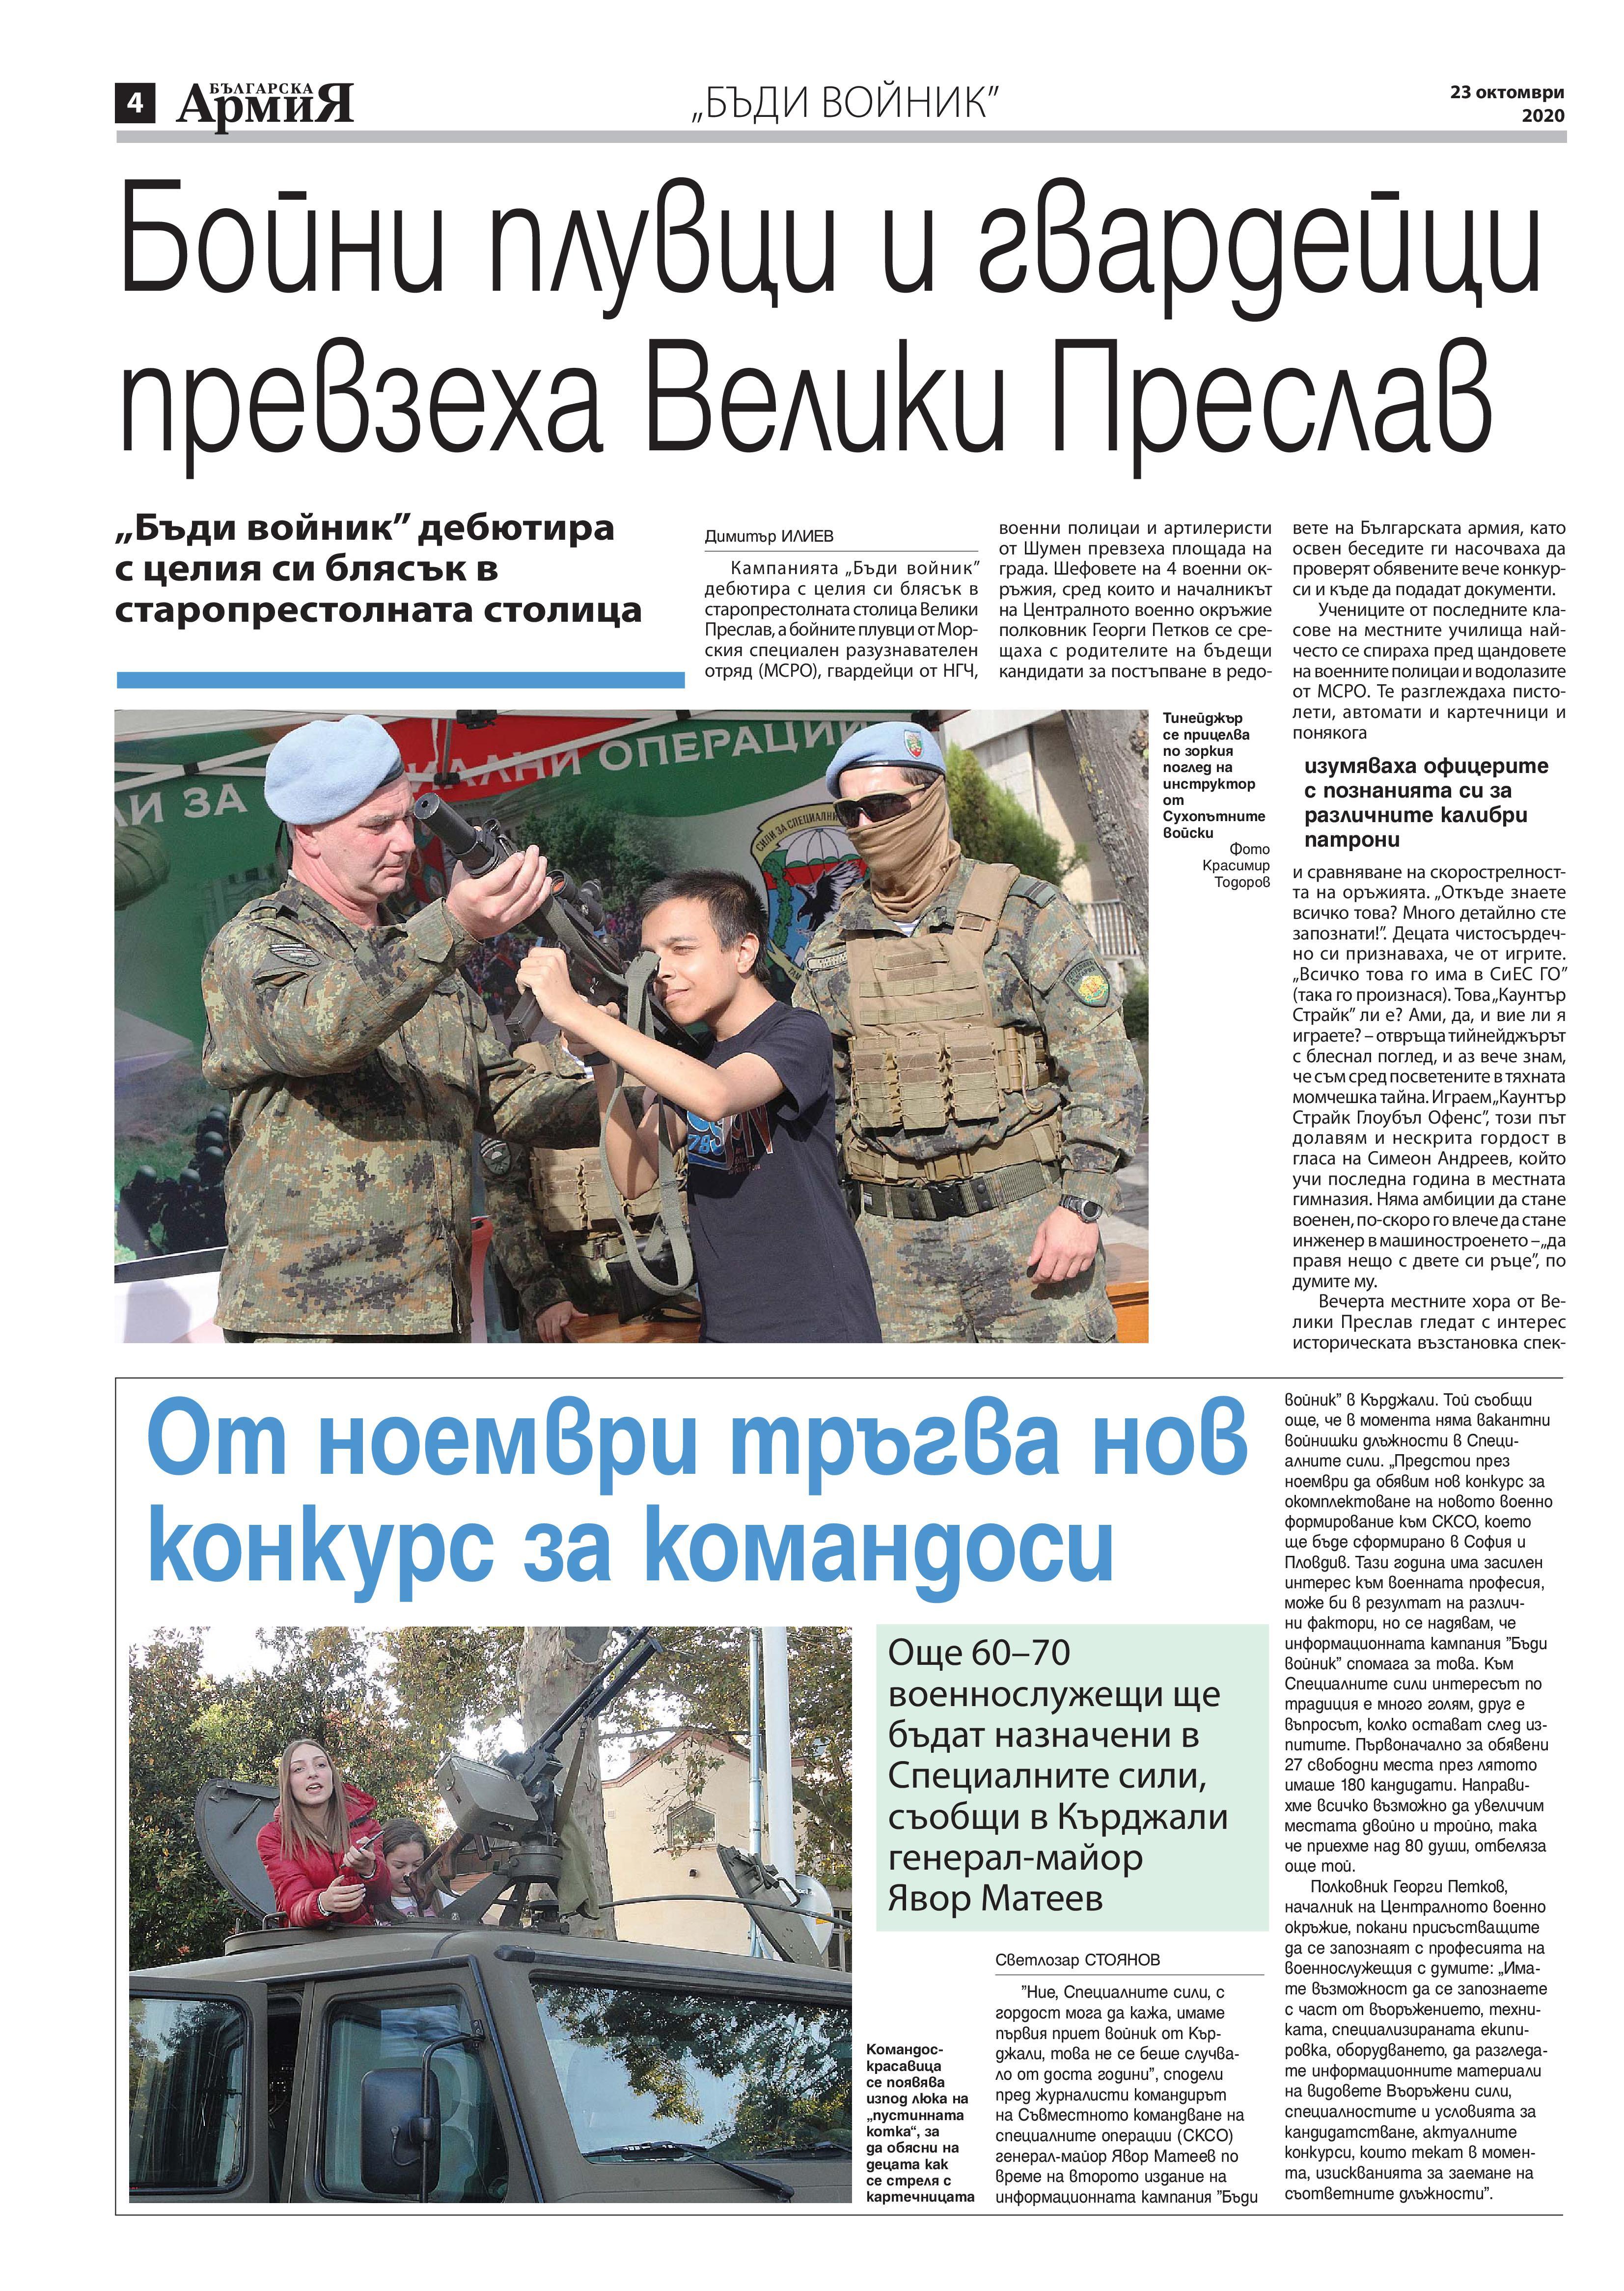 https://armymedia.bg/wp-content/uploads/2015/06/04-44.jpg